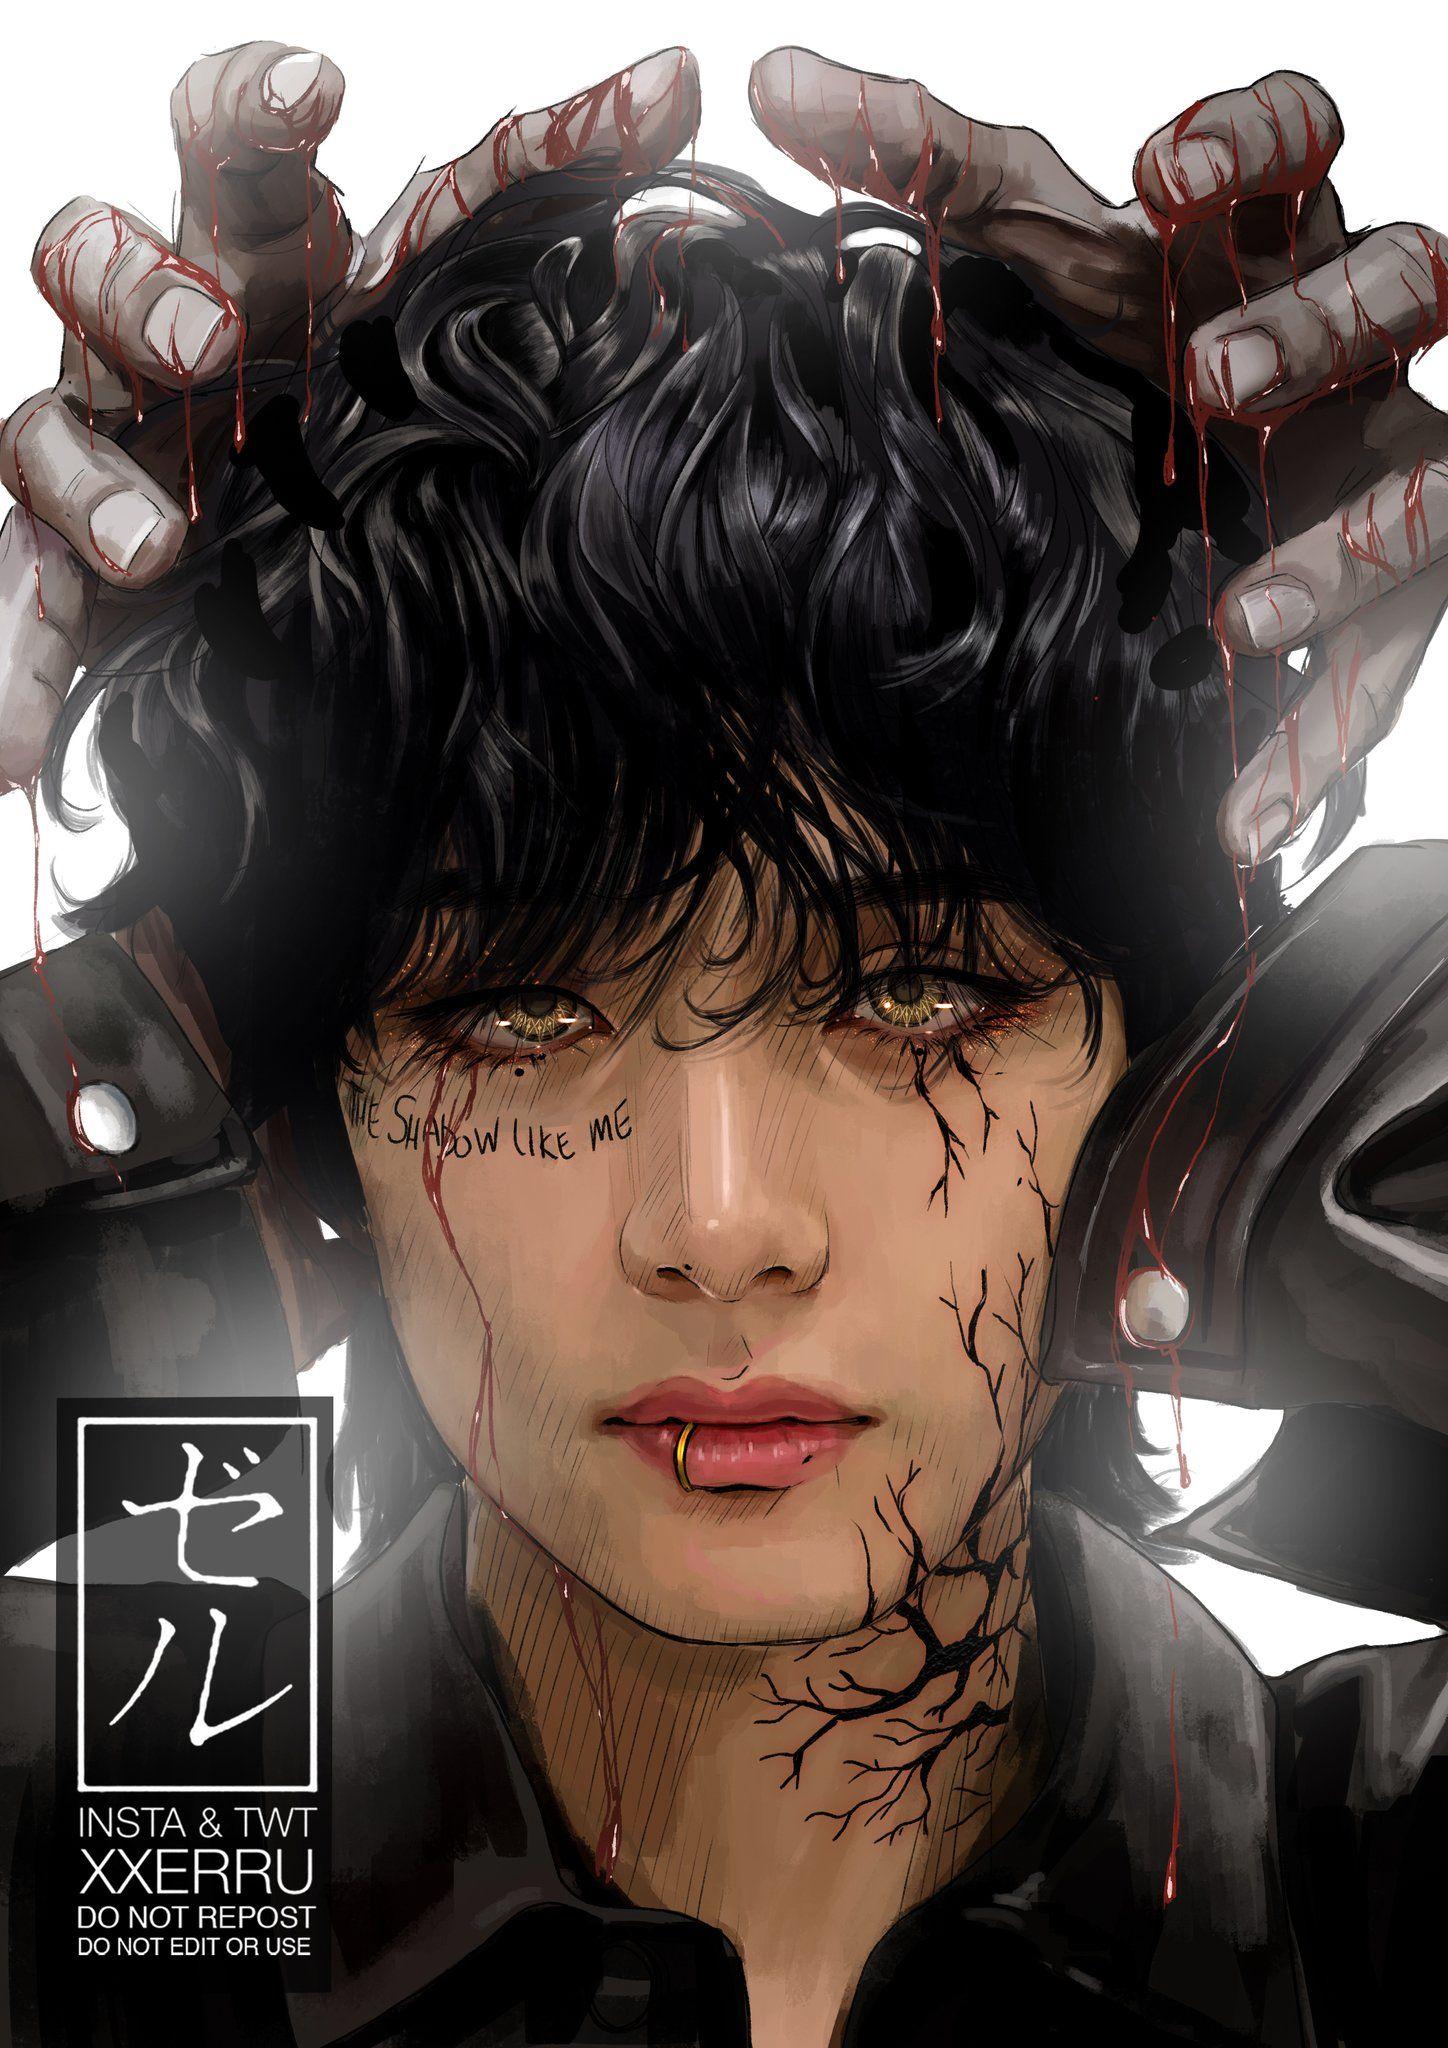 Xxerru 해즐🇭🇲 on Twitter in 2020 Bts drawings, Taehyung